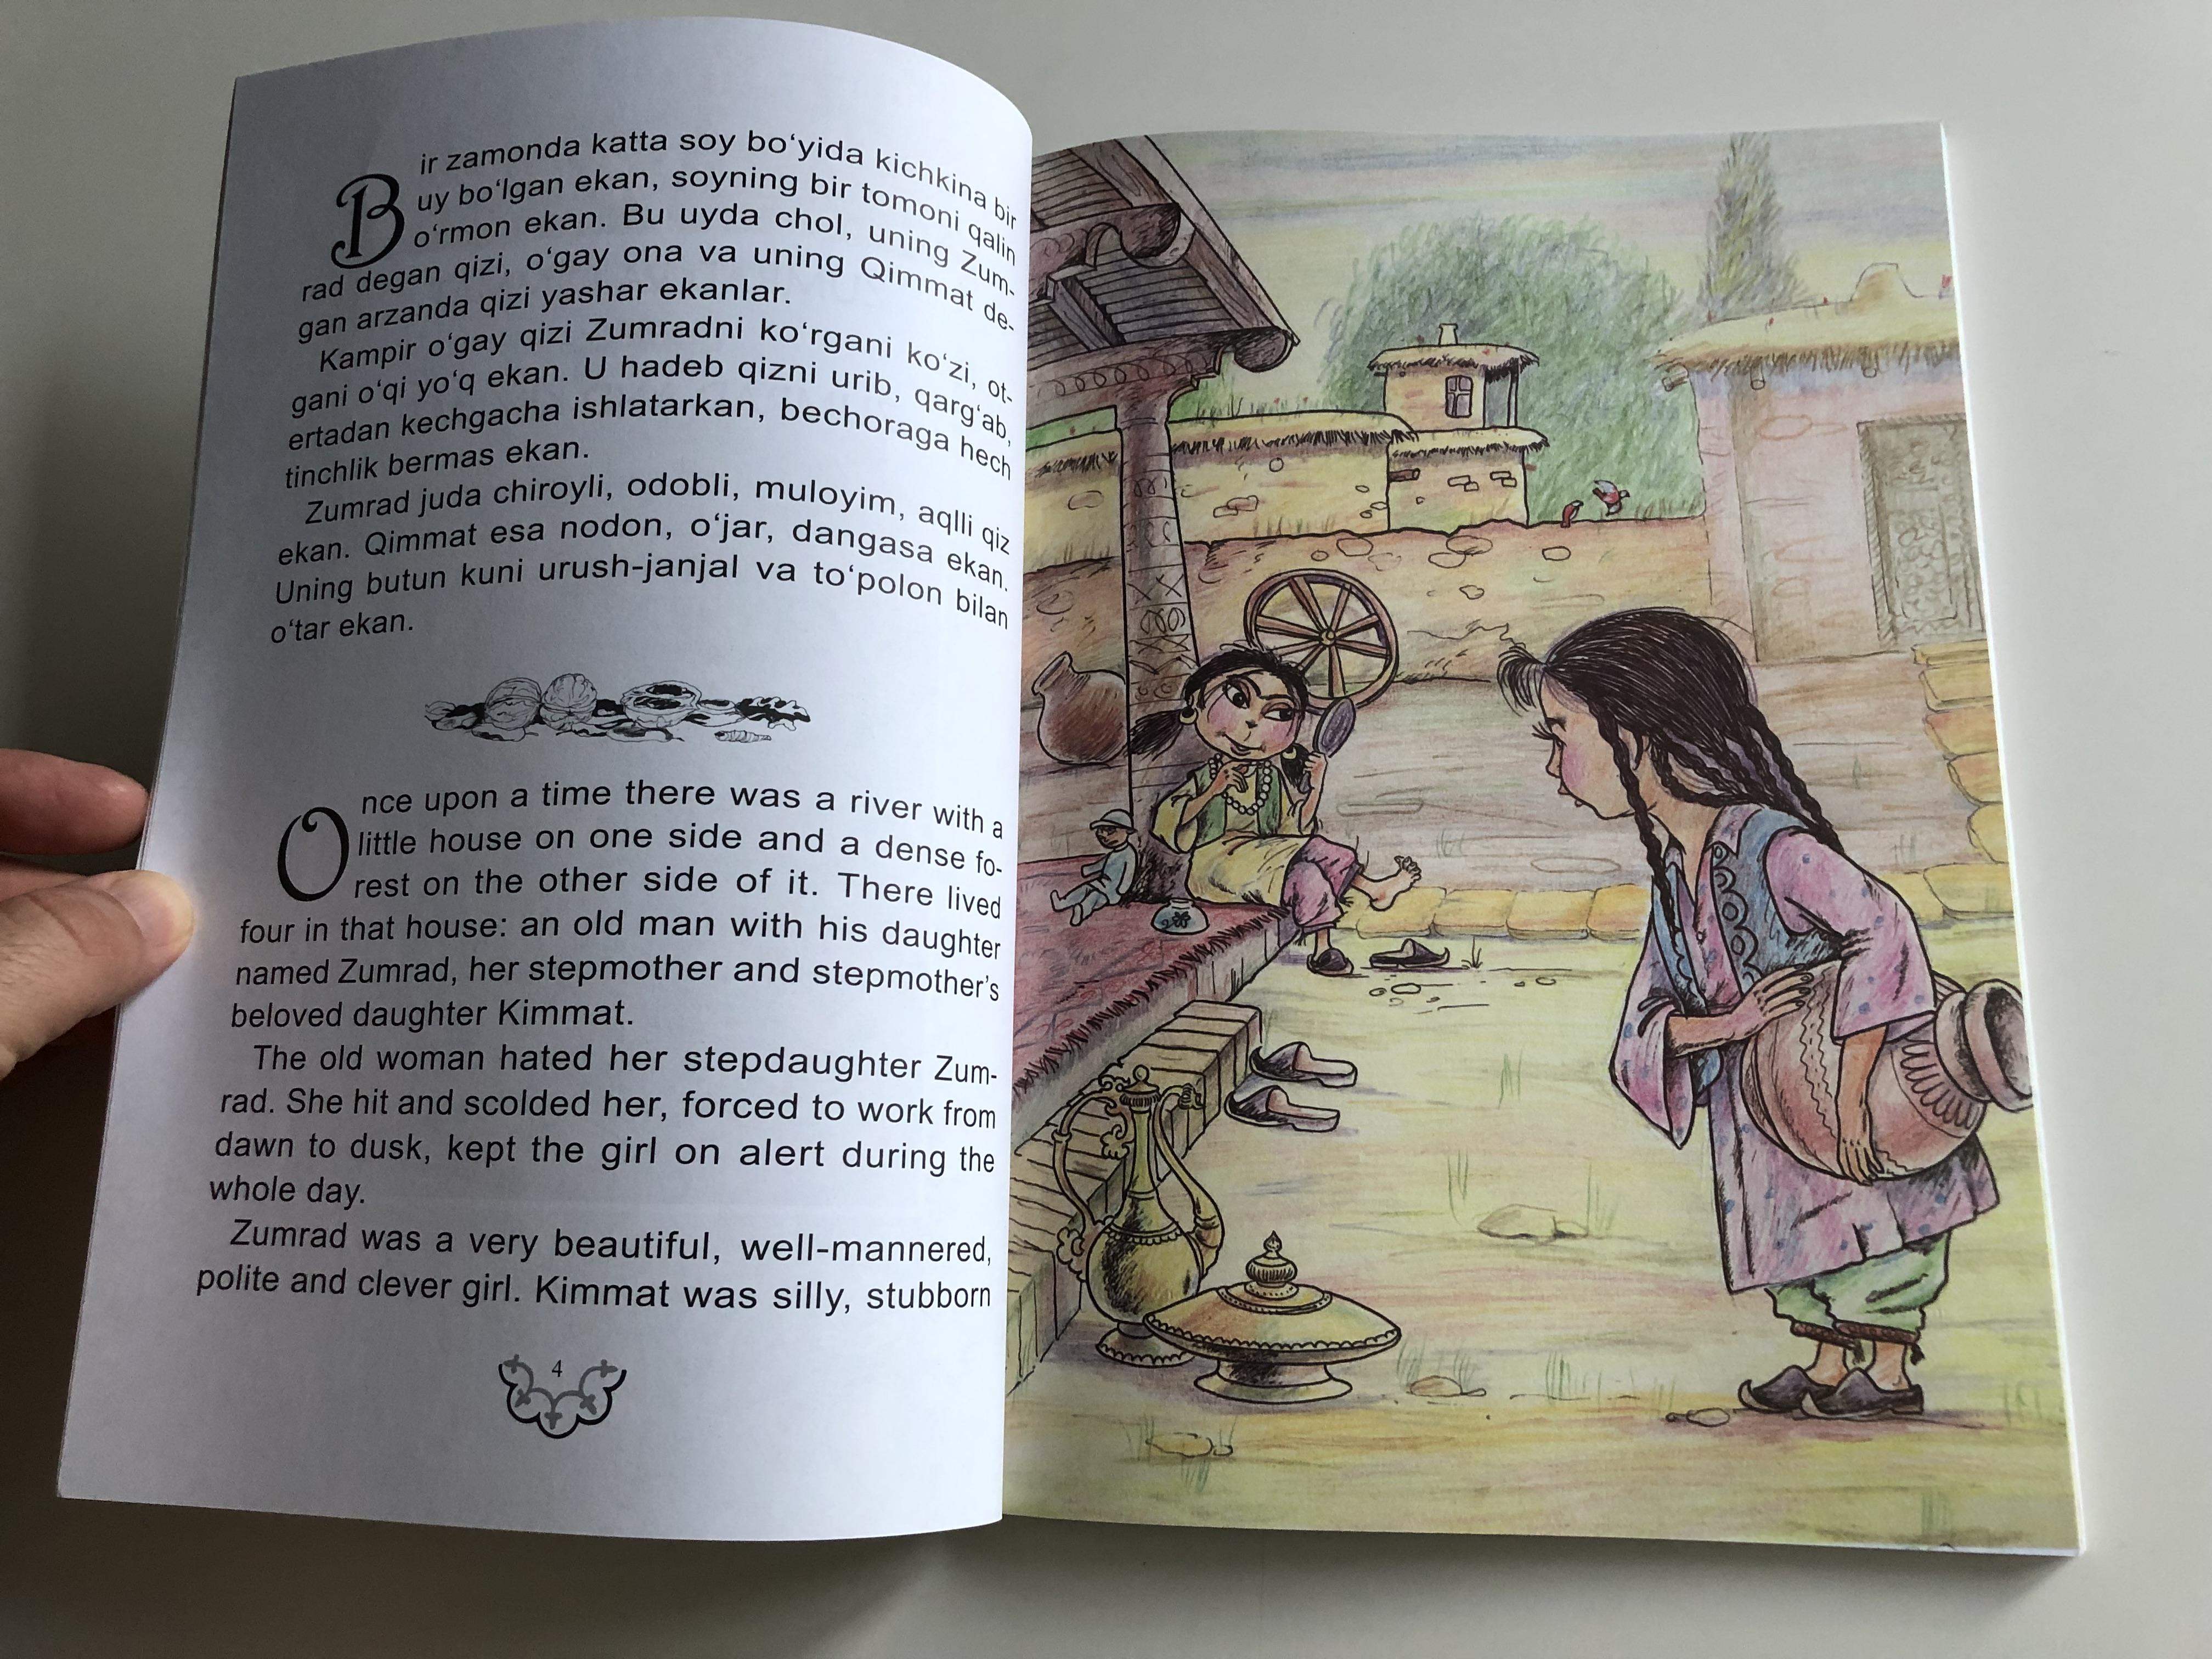 the-uzbek-folk-tales-o-zbek-xalq-ertaklari-by-husan-sodikov-uzbek-english-bilingual-edition-art-flex-paperback-2017-great-gift-for-children-4-.jpg